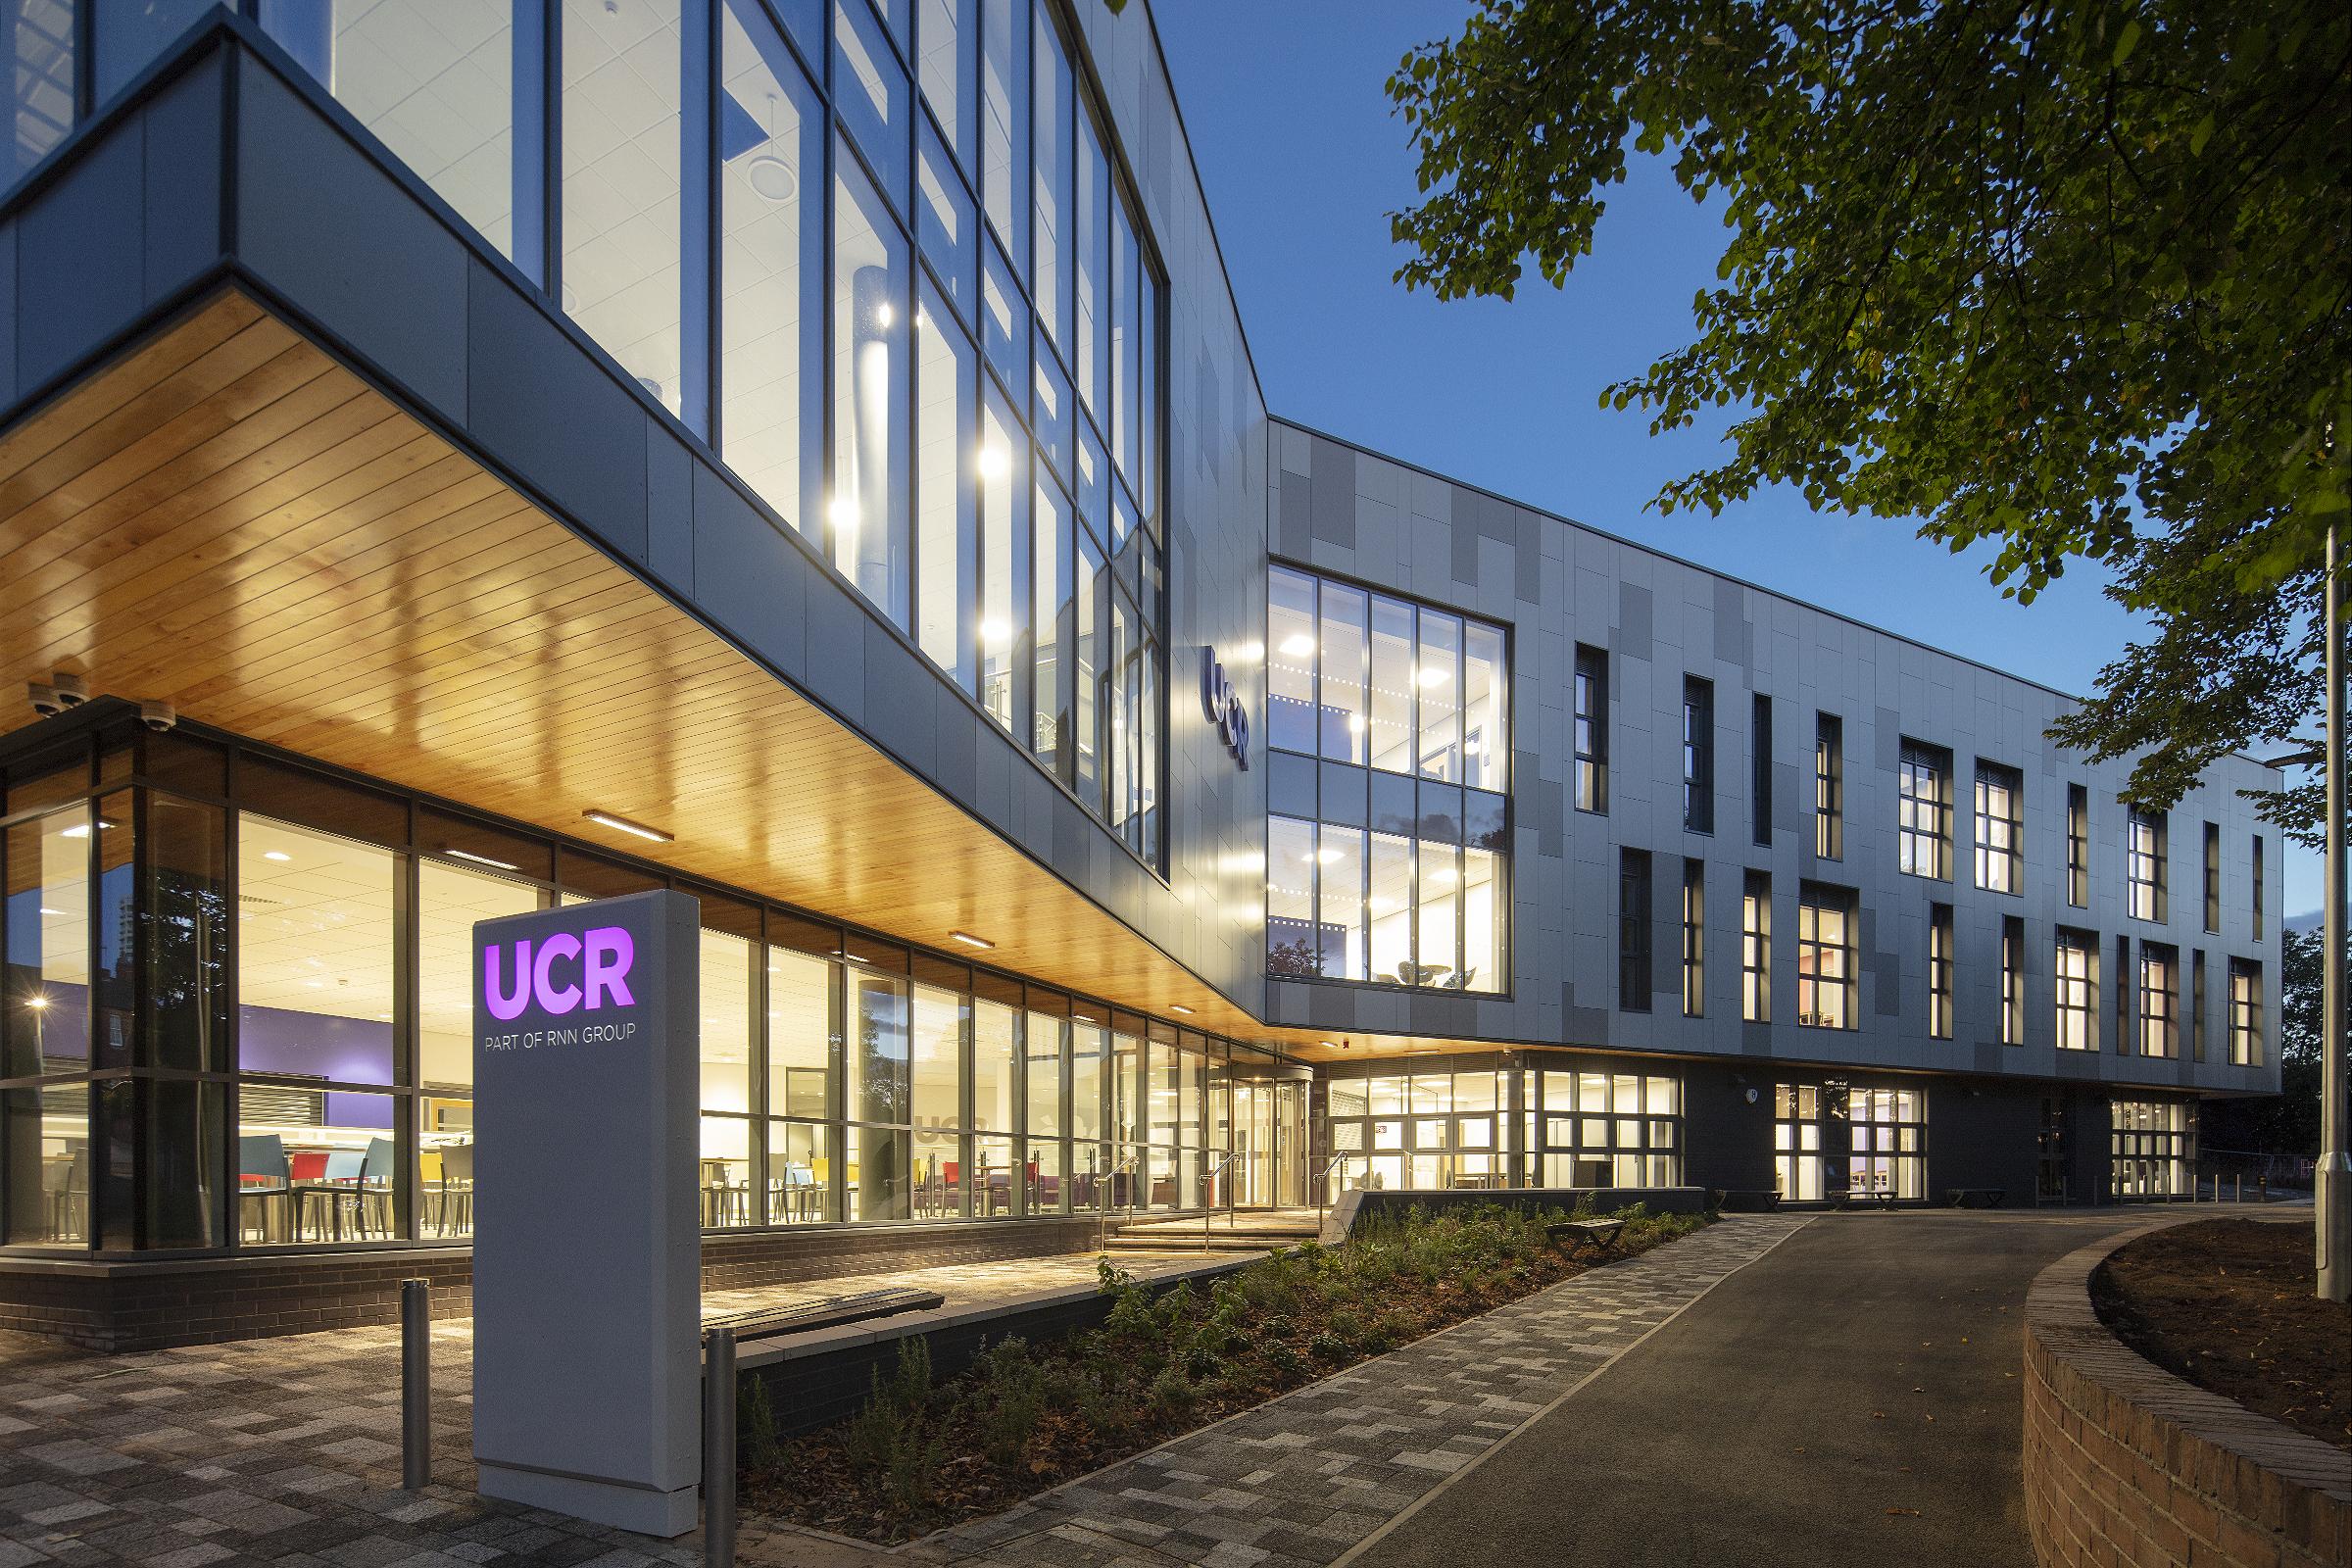 University College Rotherham 074.jpg